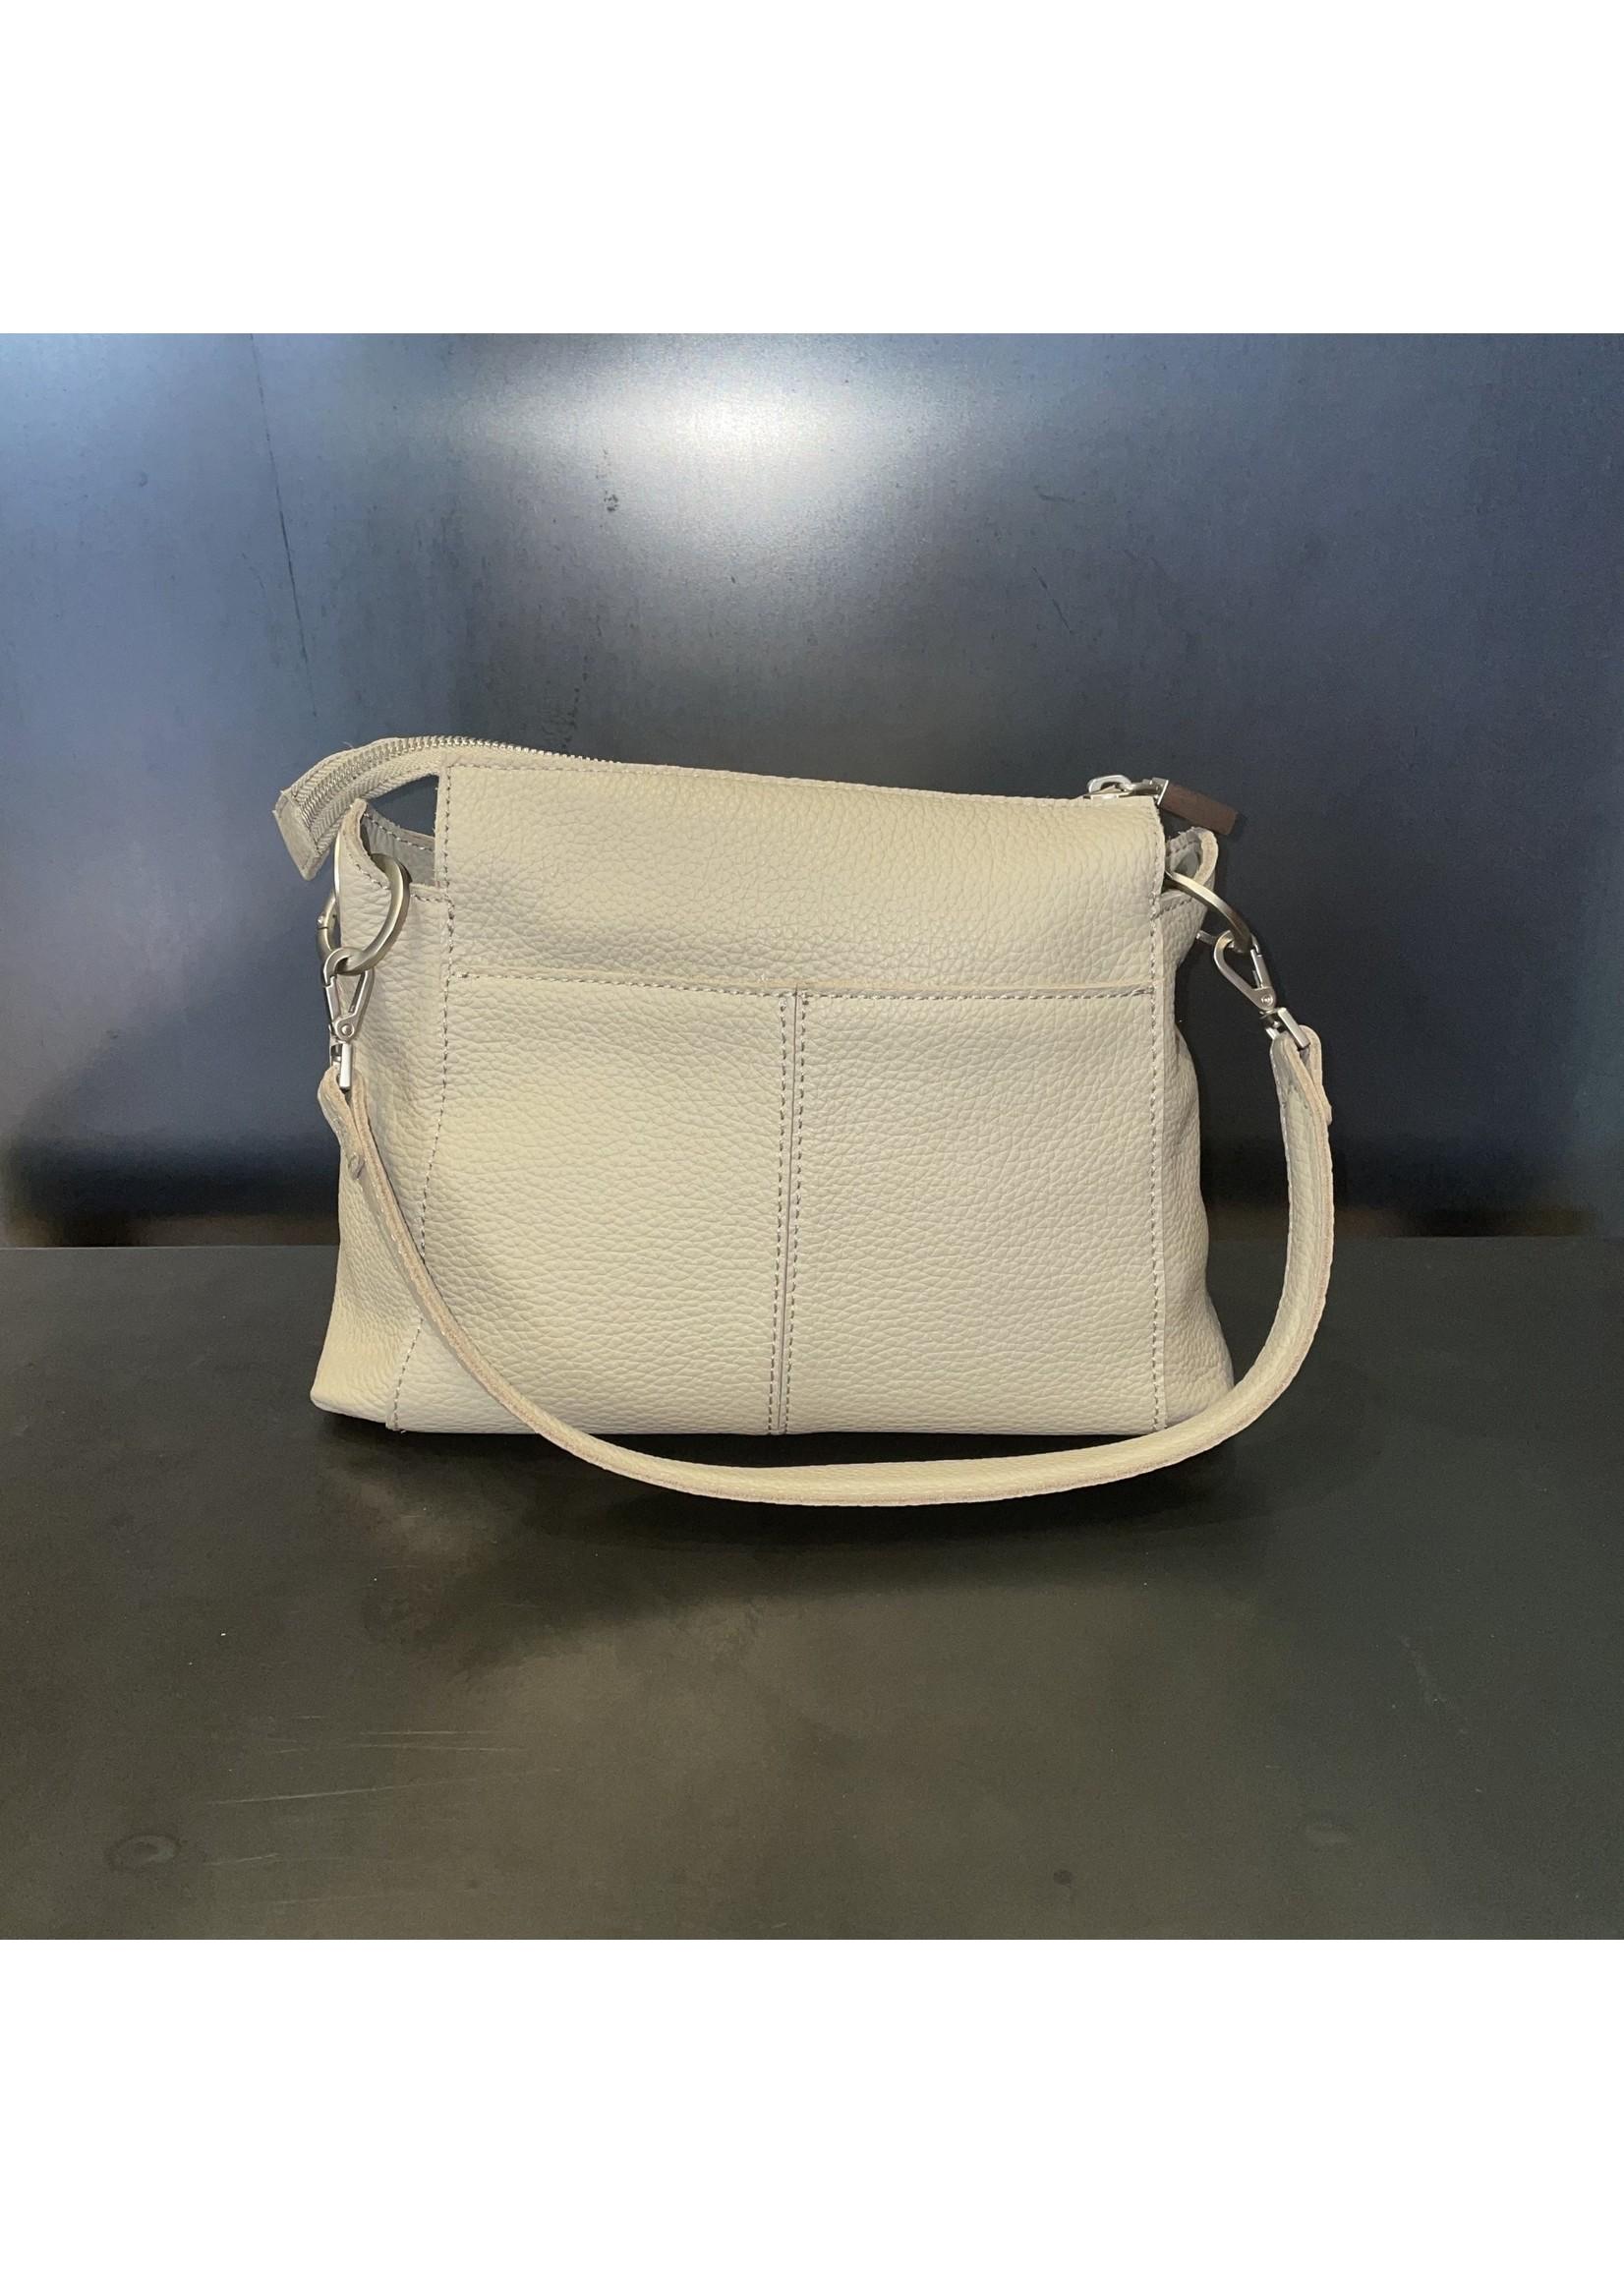 Hammitt Hammitt Bryant Medium Handbag - P-72893